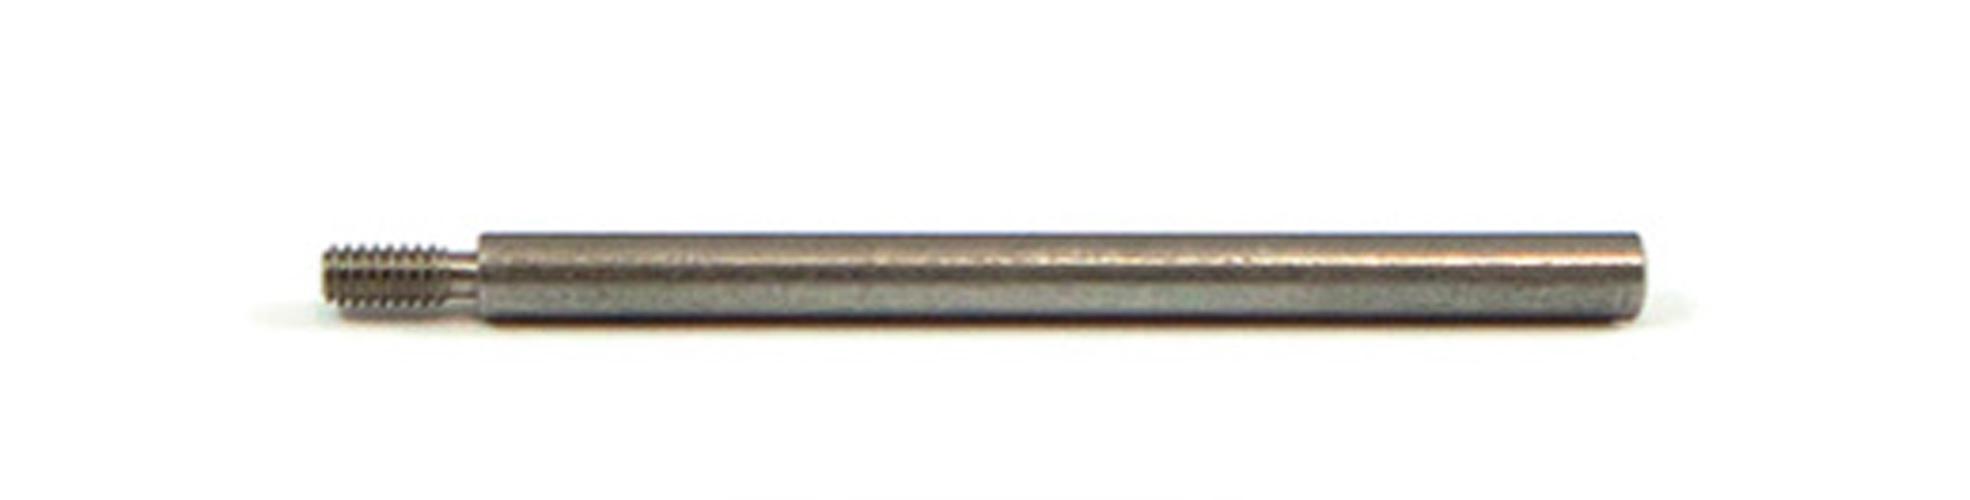 Key Rod - G# Key - Buffet 6020 /6010 Flute